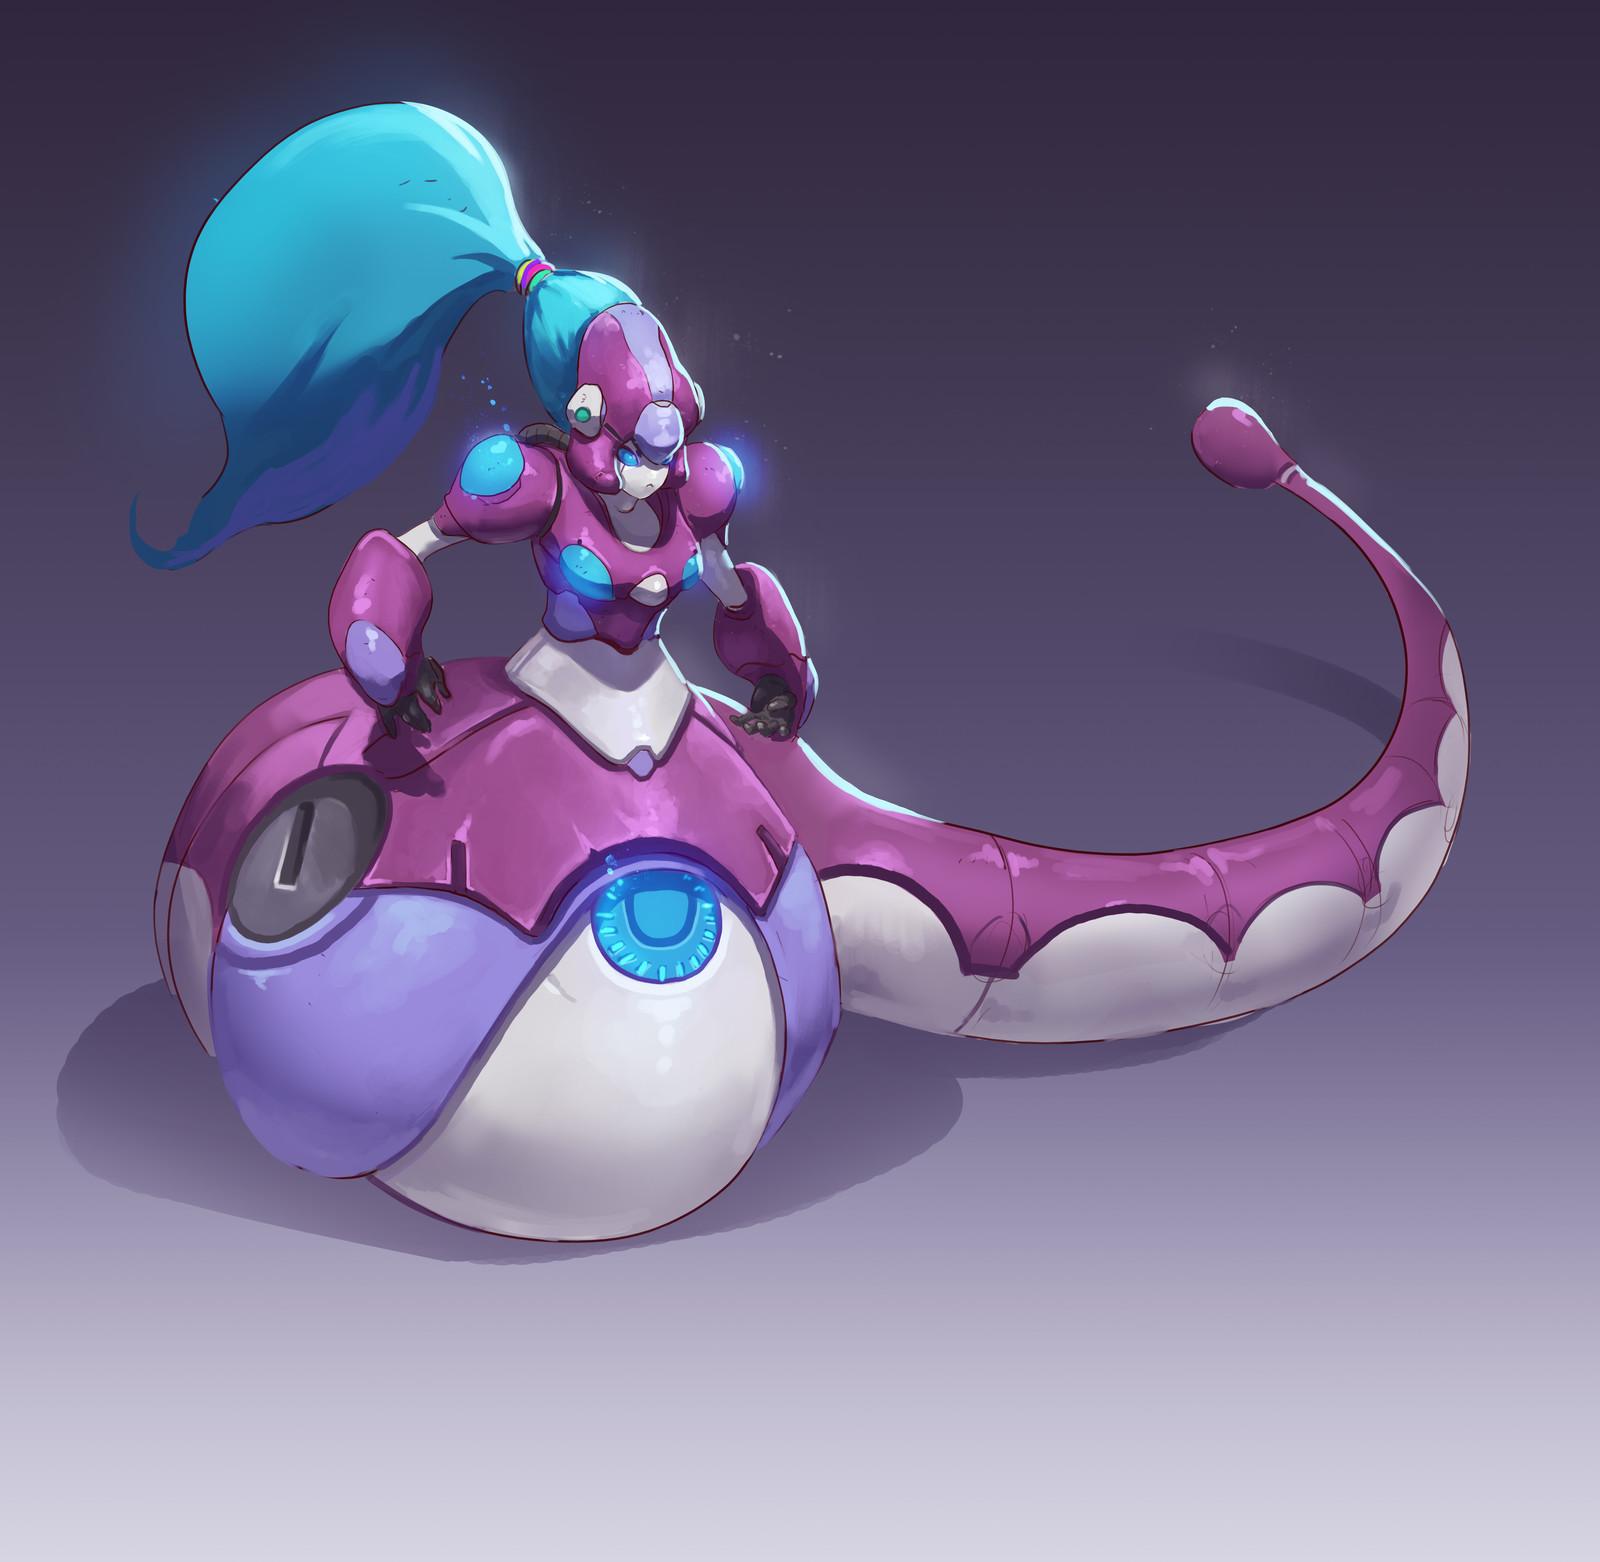 Robot Naga